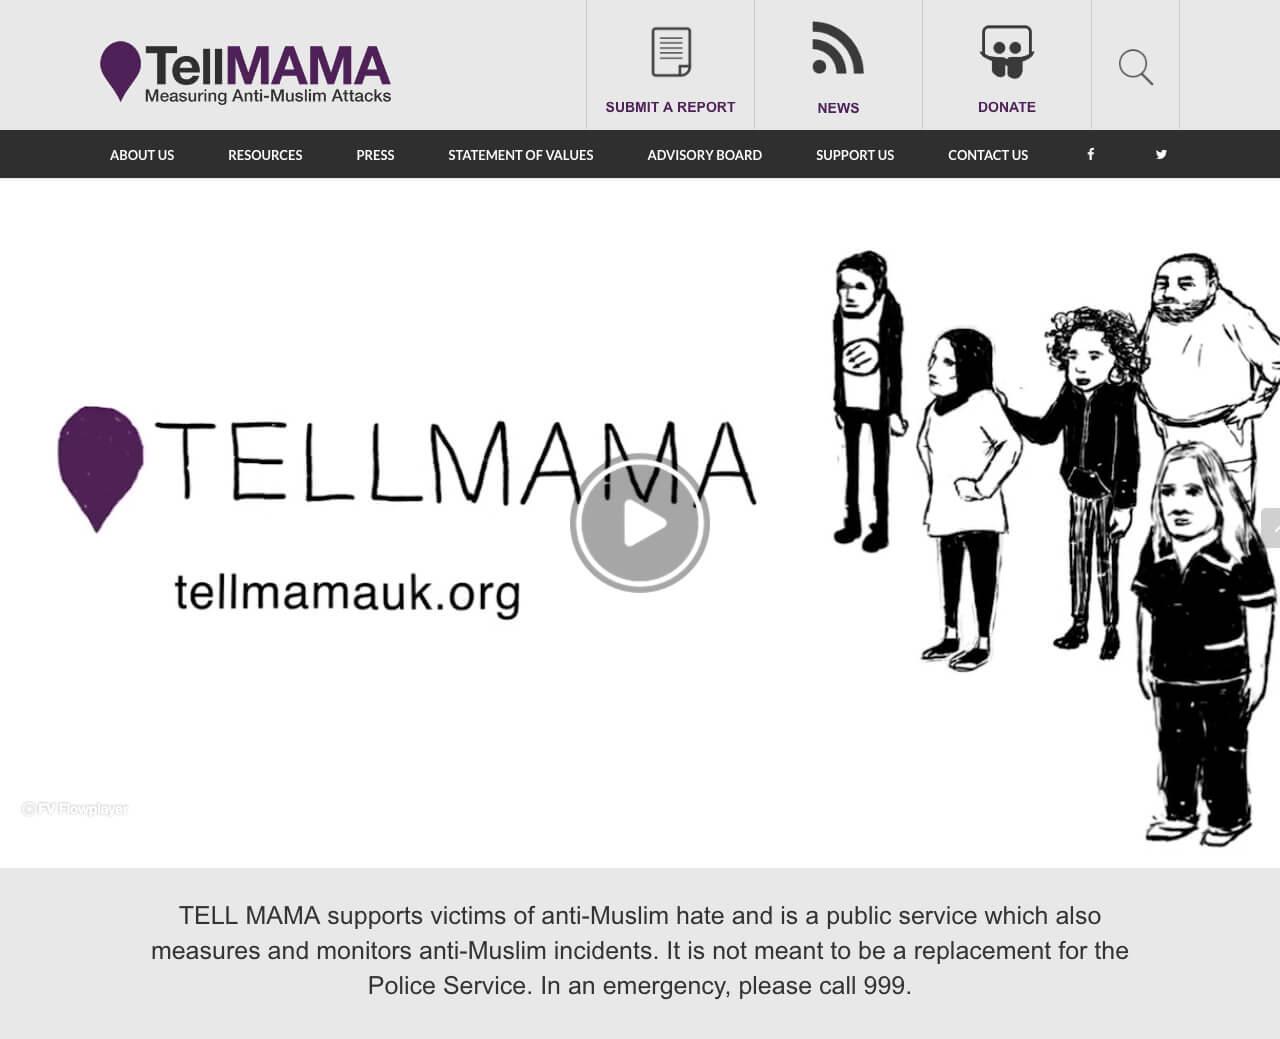 tellmama